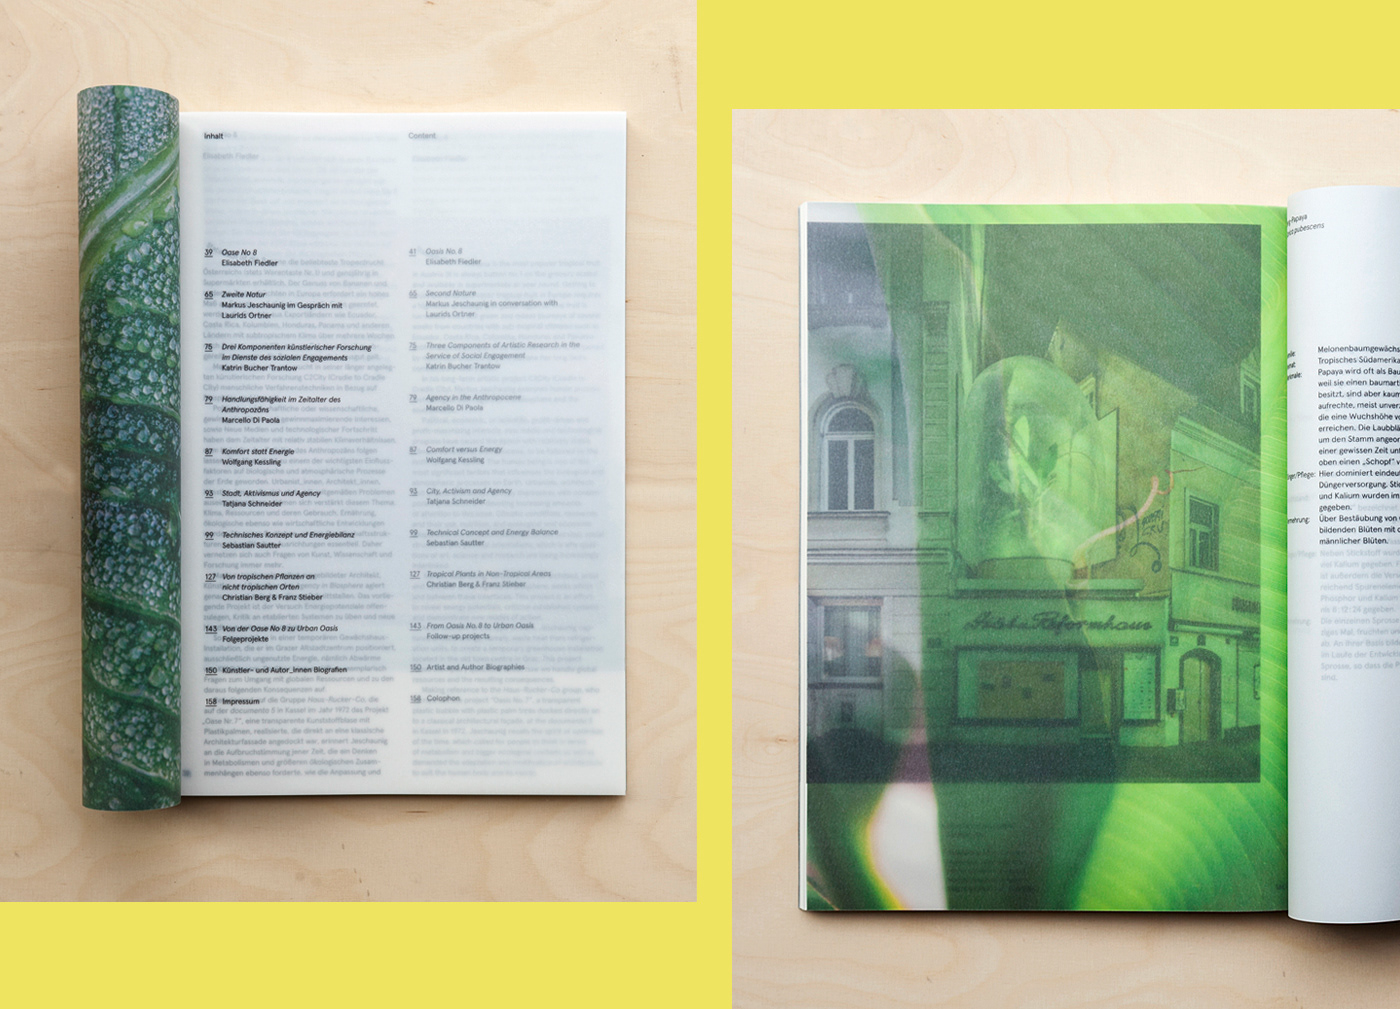 banana Urban book buch artist book architektur architecture yellow Transparency transparent